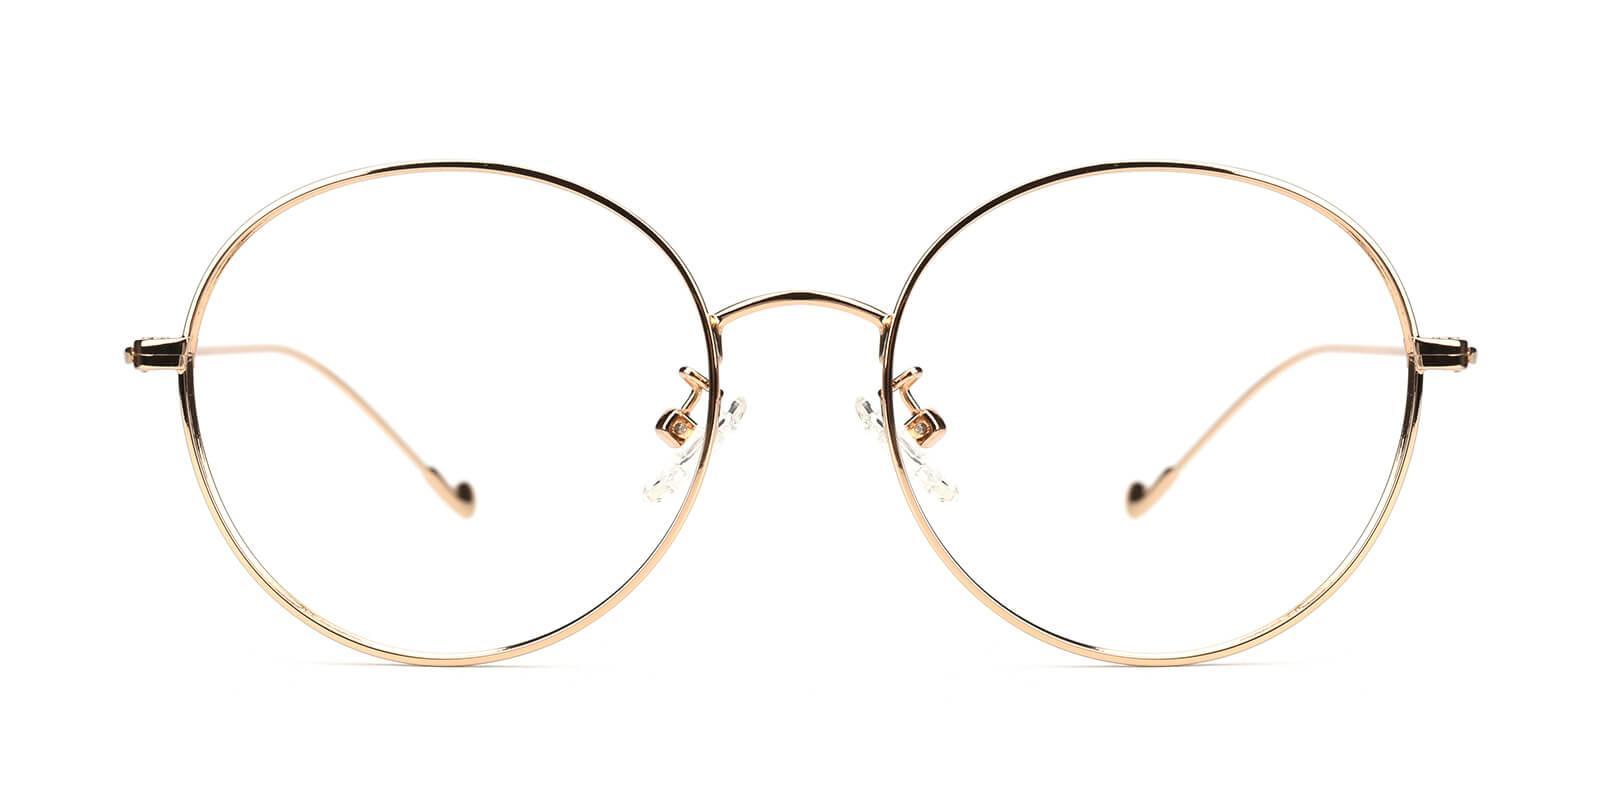 Jessy-Gold-Round-Metal-Eyeglasses-additional2